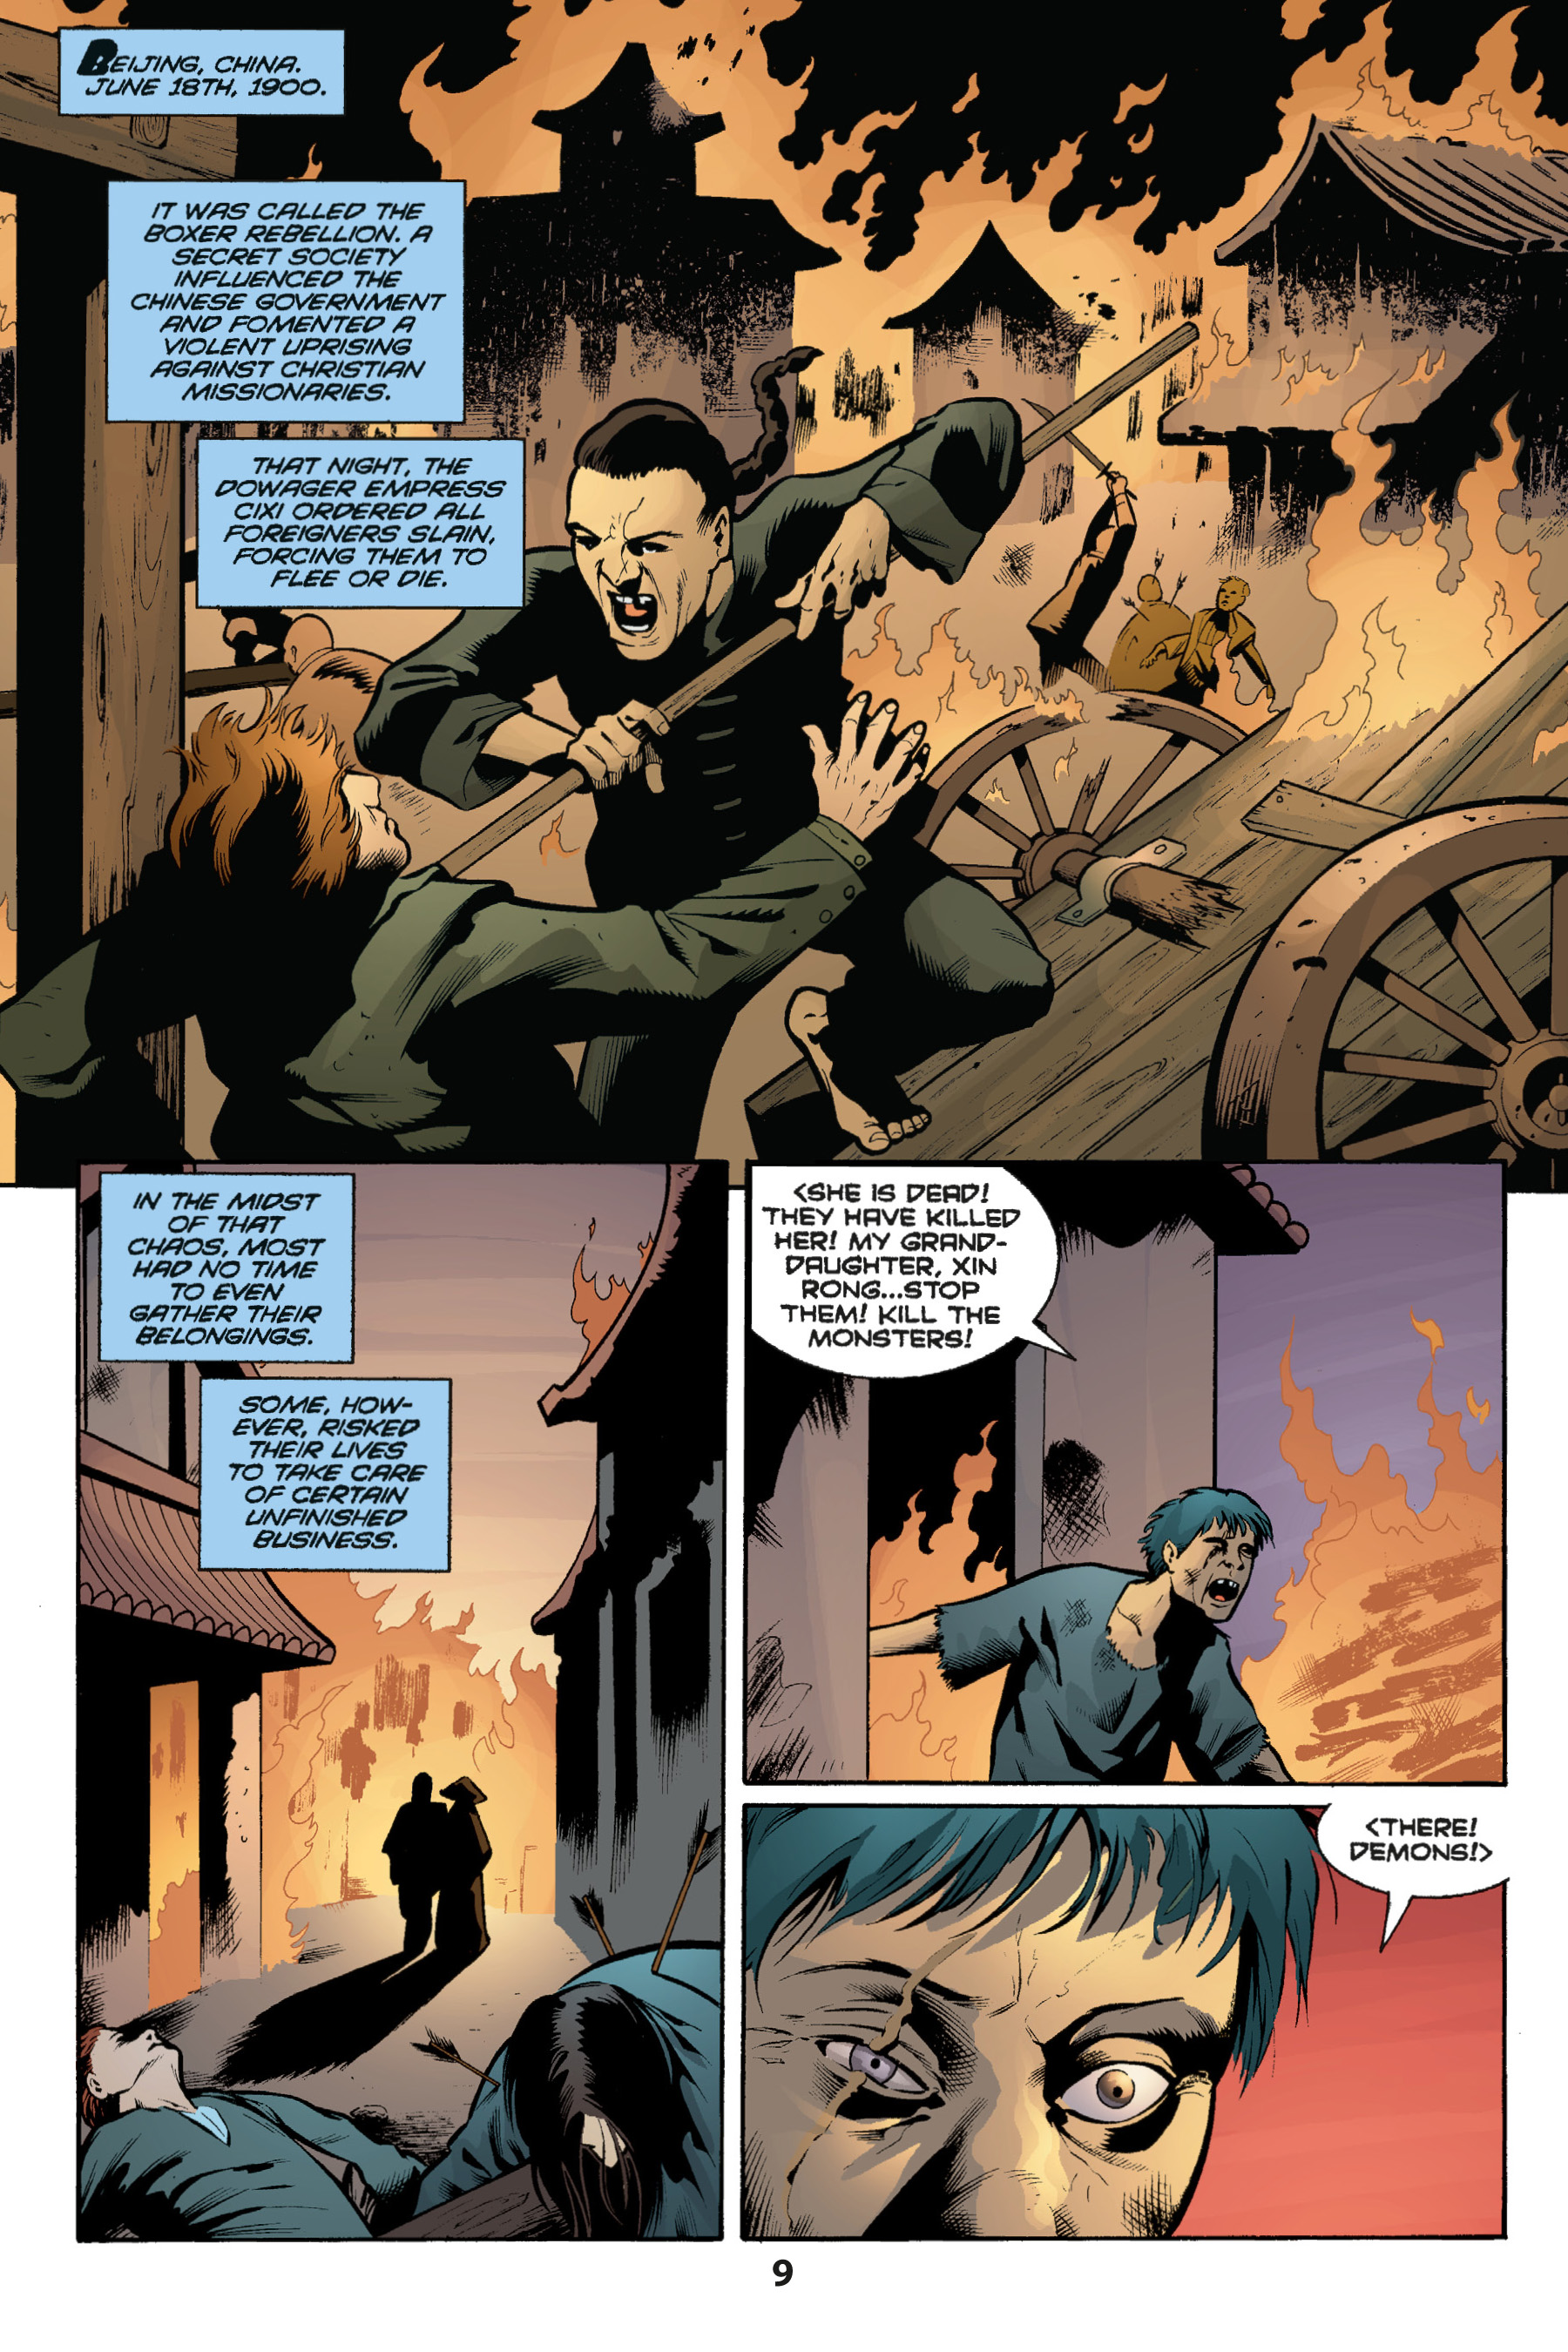 Read online Buffy the Vampire Slayer: Omnibus comic -  Issue # TPB 1 - 11